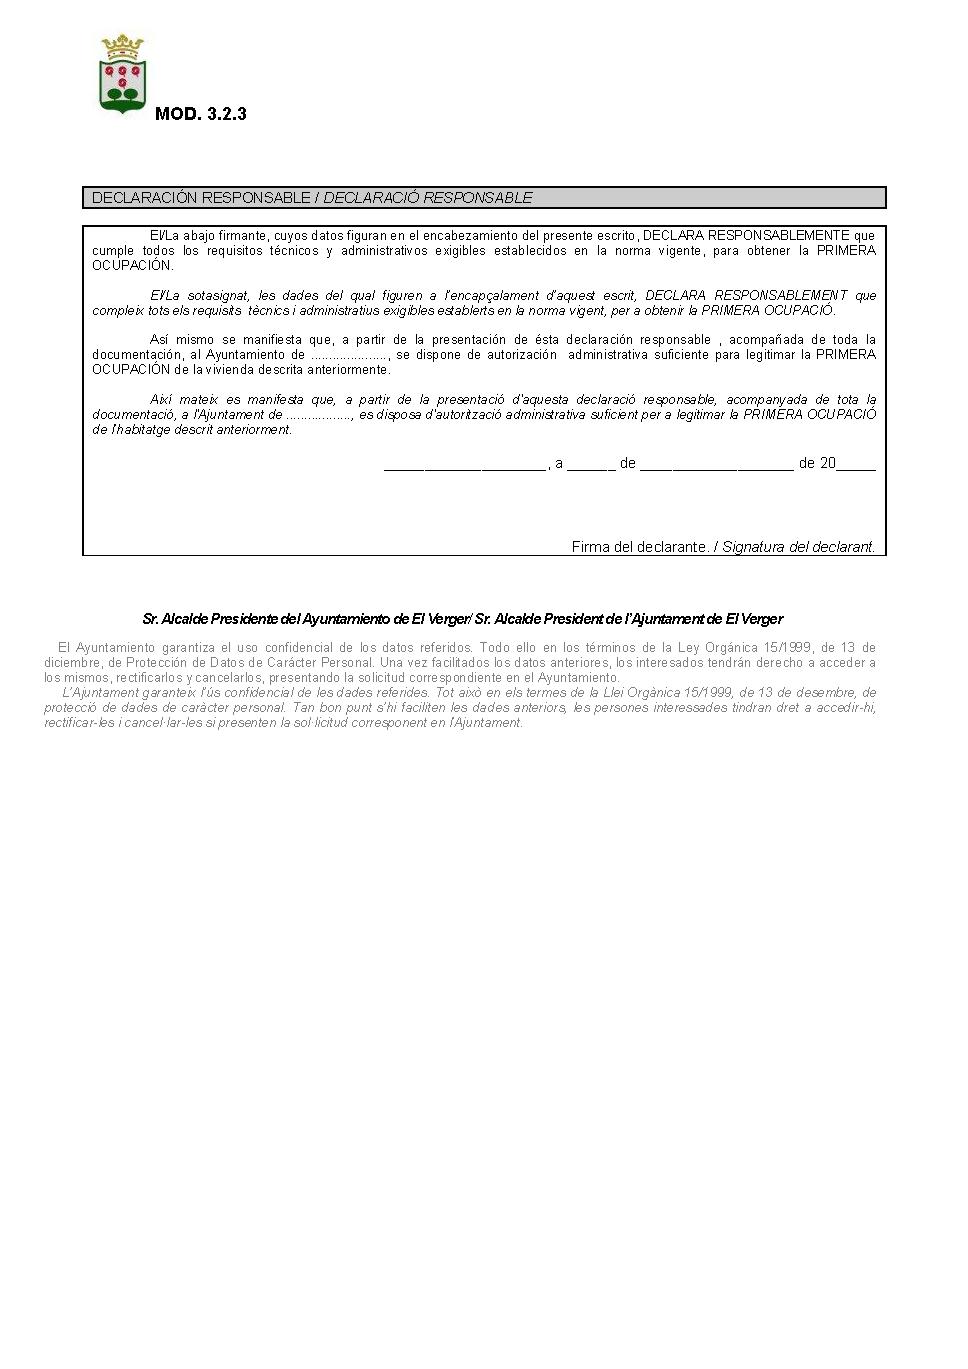 Declaración-responsable-2ª-ocupación-model-3.2.3_Verger-Página_2